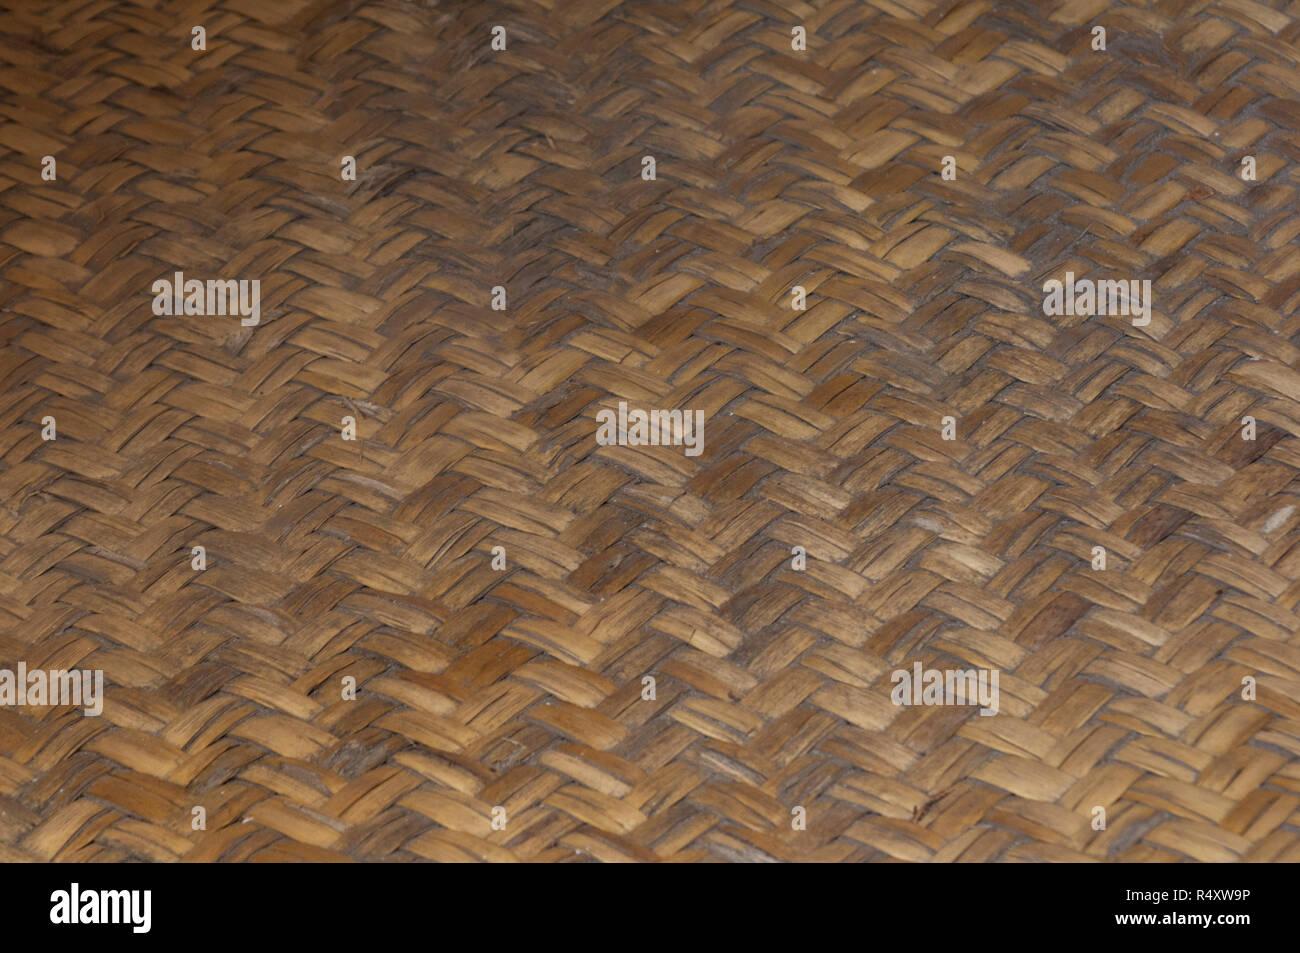 Chumash woven floor mat (reconstruction), La Purisima Mission State Historic Park, California. Digital photograph - Stock Image